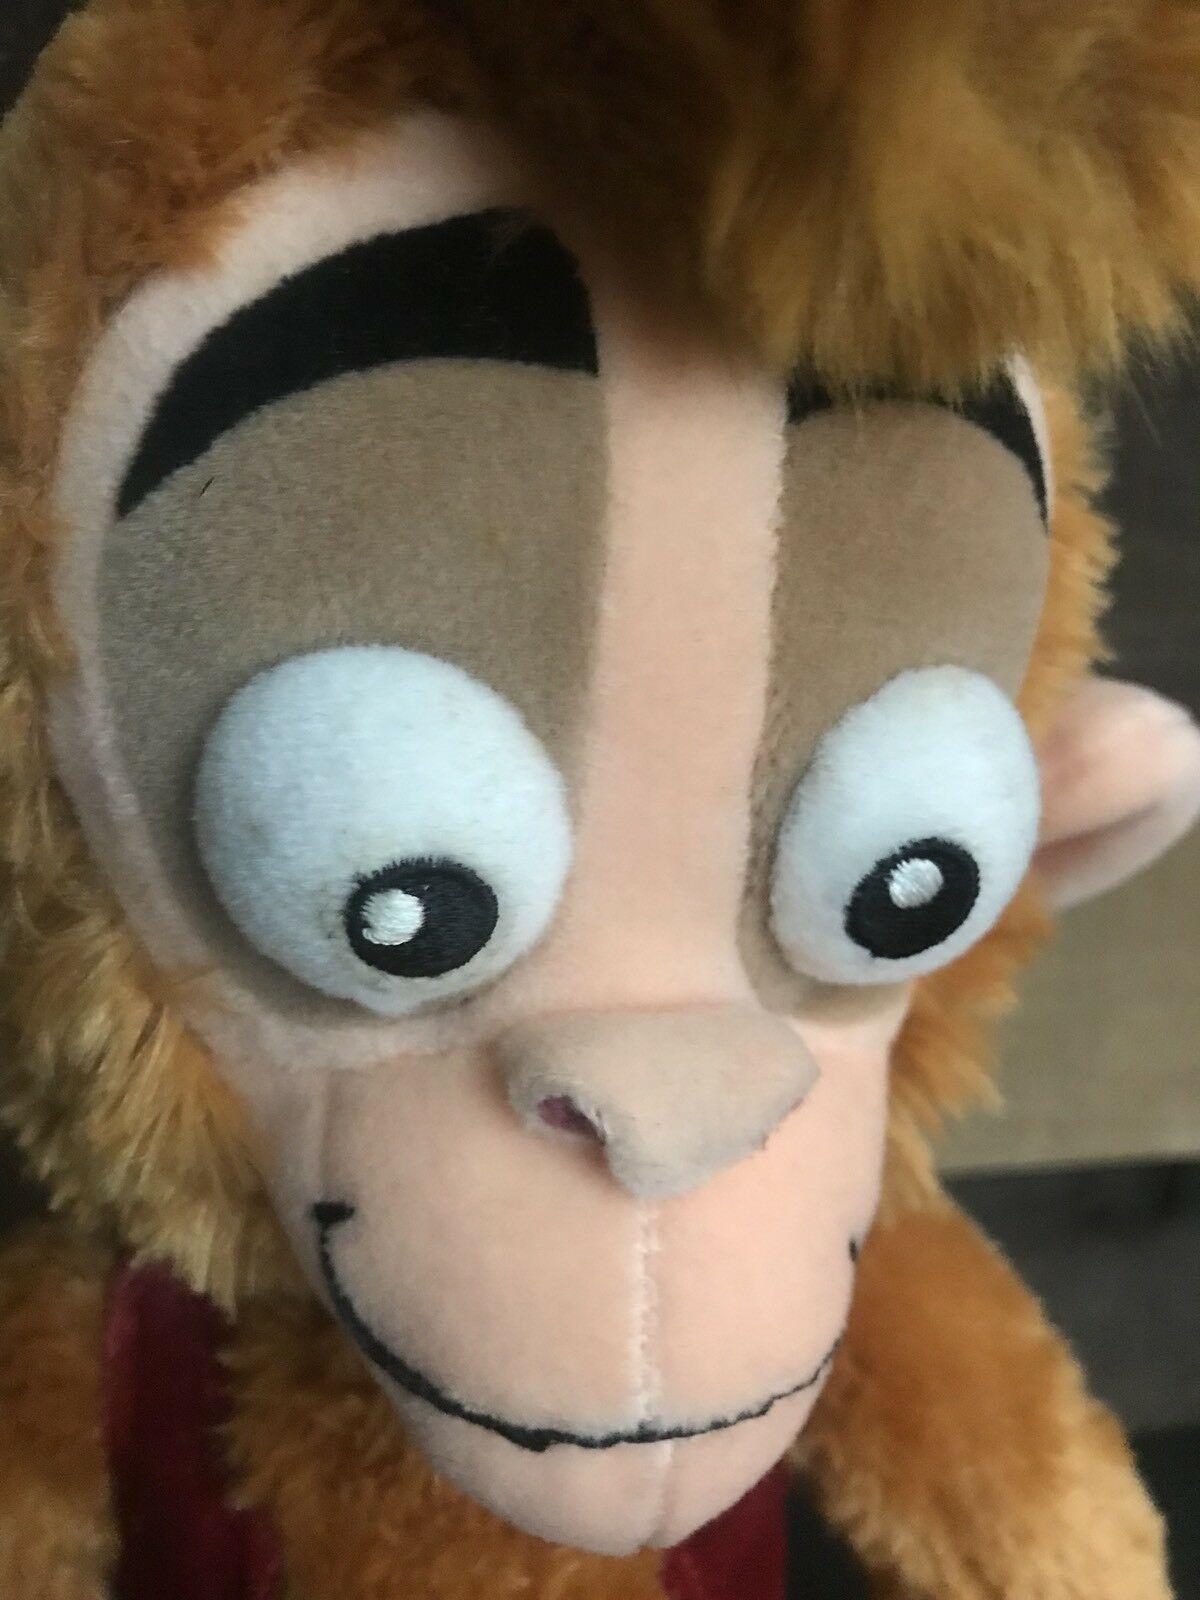 Disney Store Exclusive Apu Monkey Aladdin Plush Stuffed Animal Rare